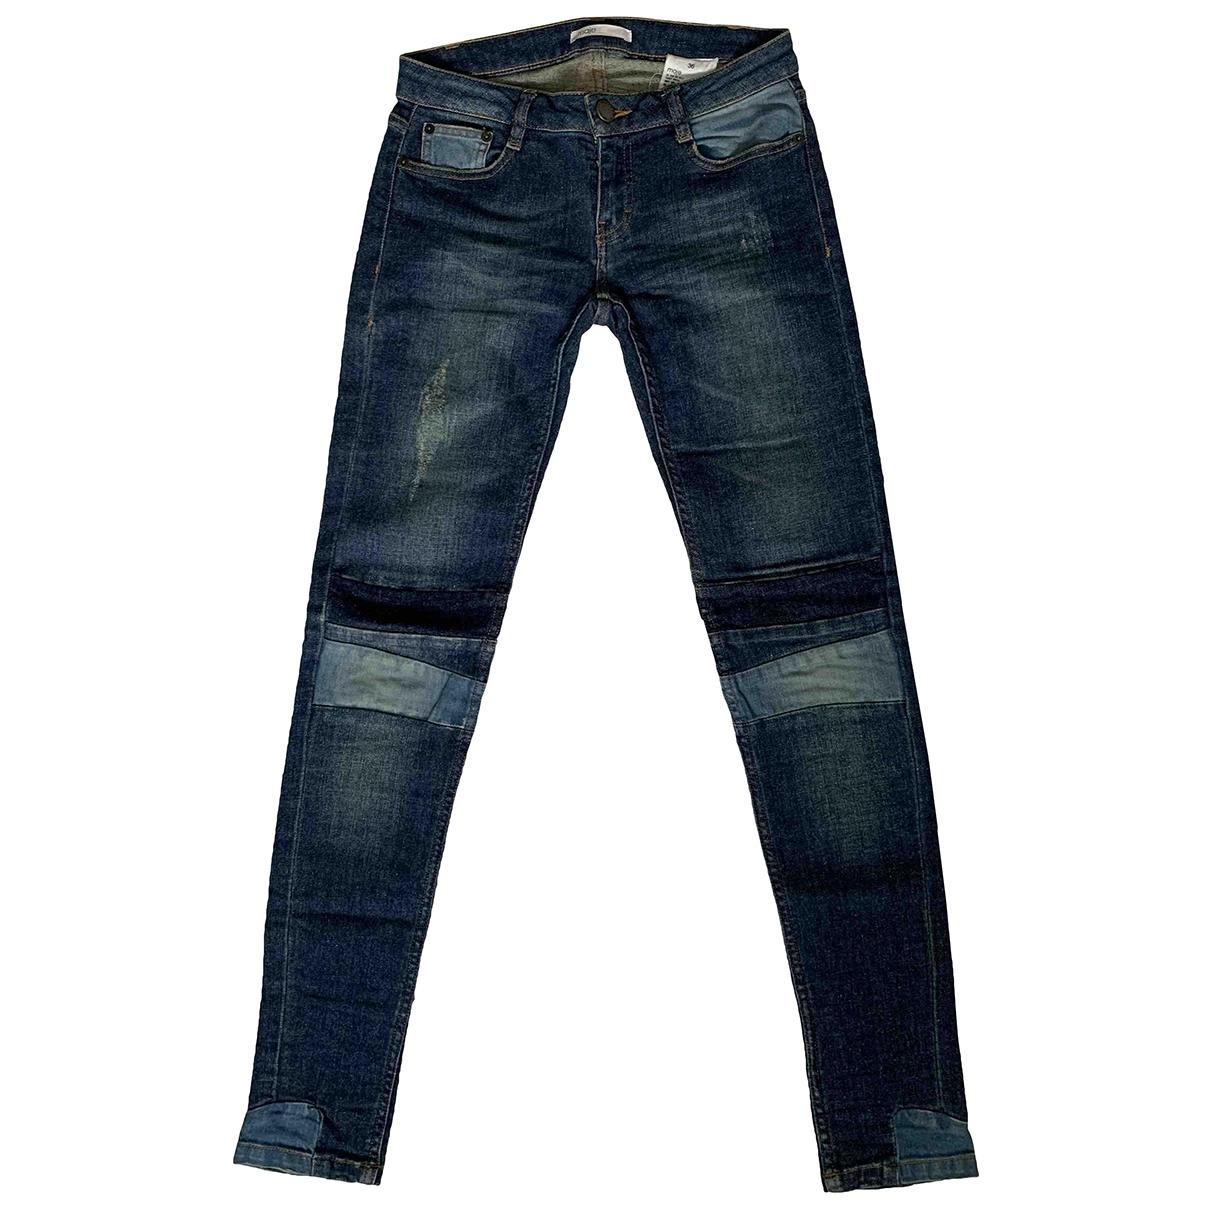 Maje \N Blue Denim - Jeans Jeans for Women 36 FR